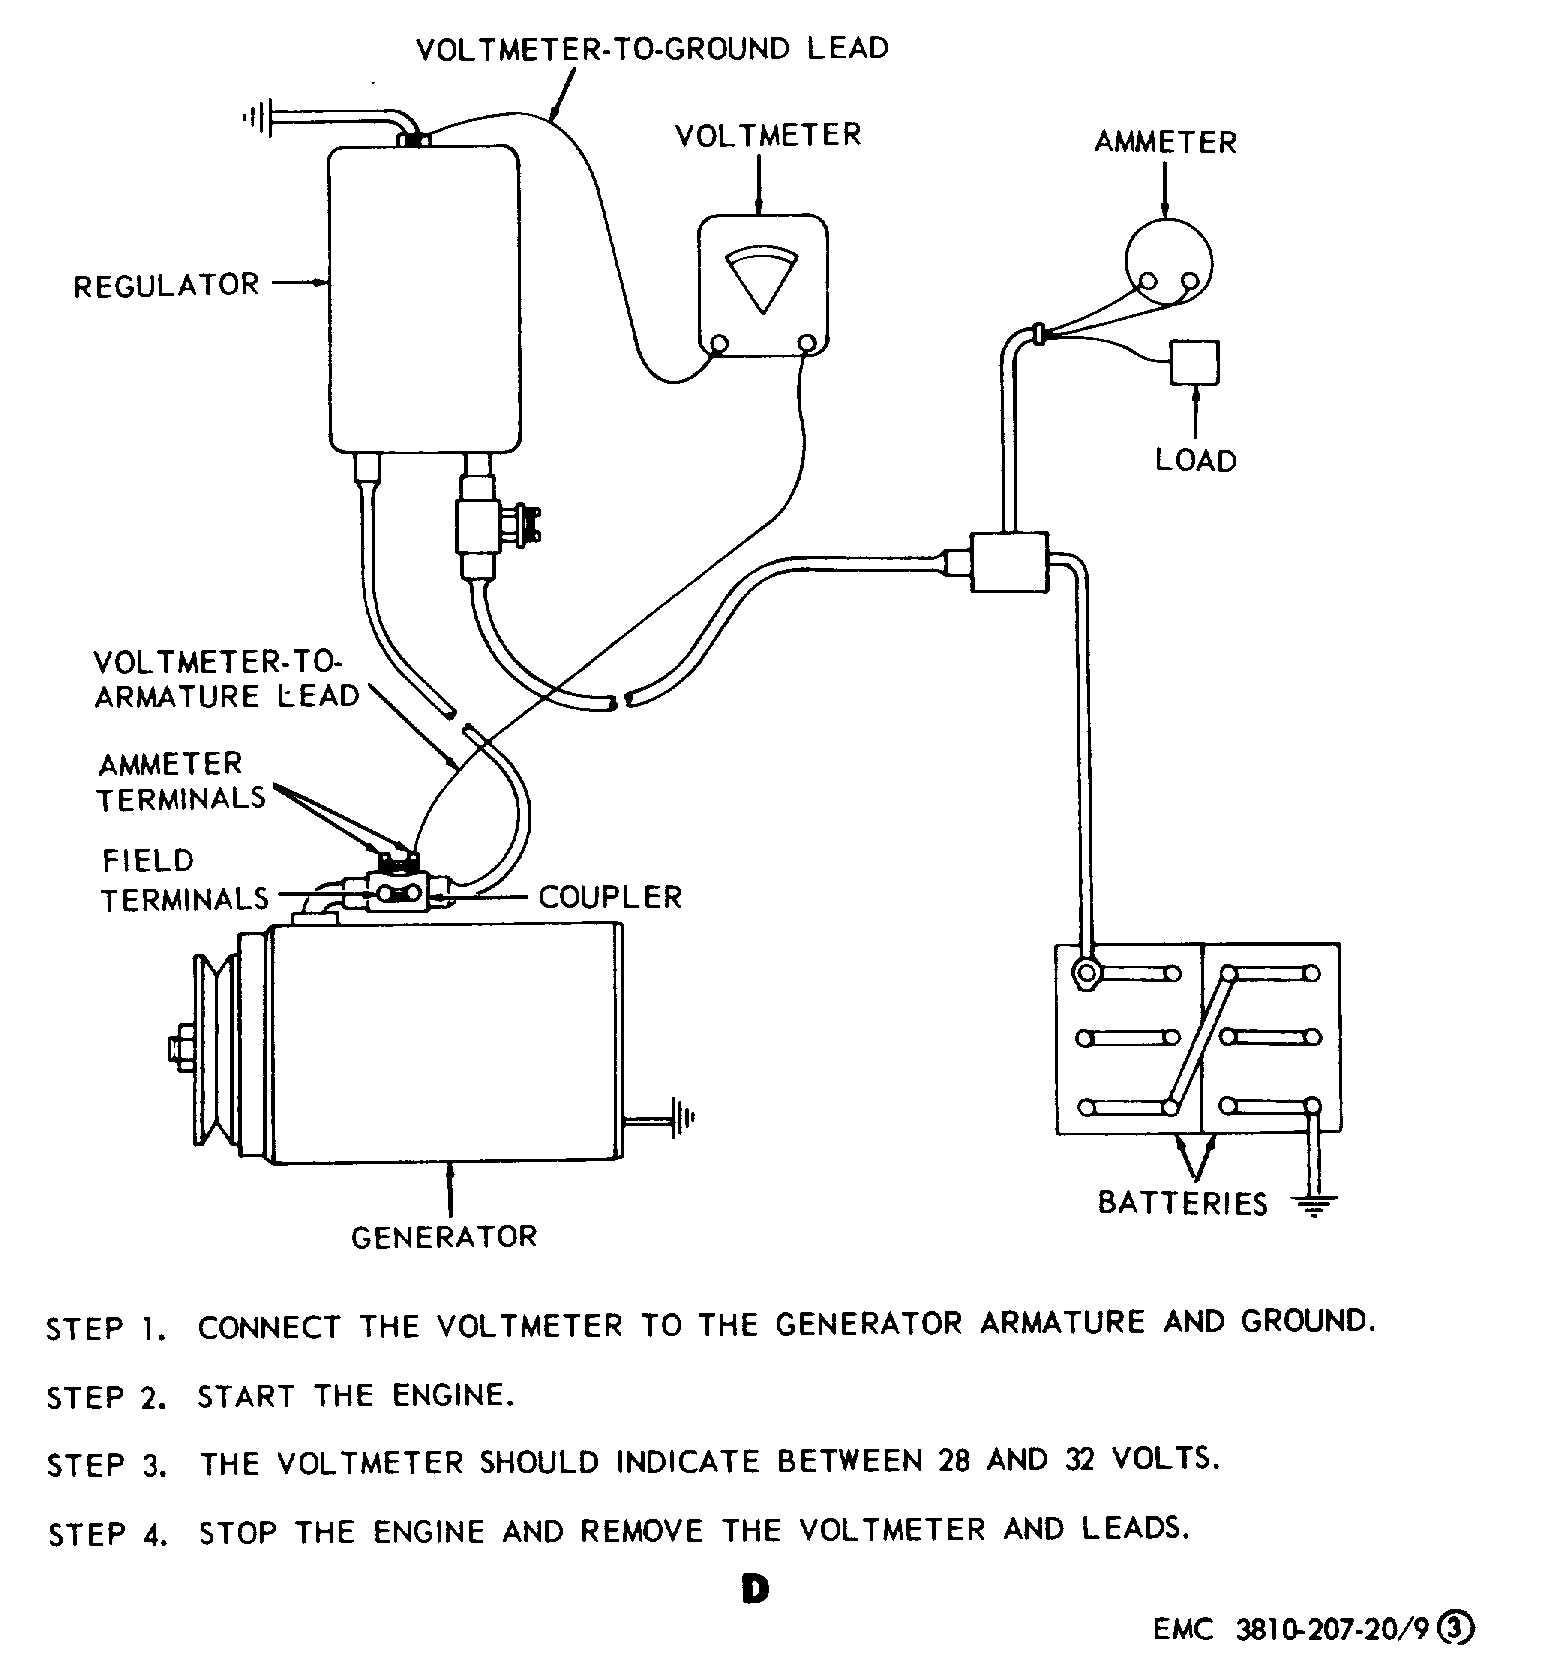 Kohler voltage regulator wiring diagram stator wiring diagram blurts kohler voltage regulator wiring diagram how to test kohler voltage regulator ebay wiring diagram ponents of publicscrutiny Image collections